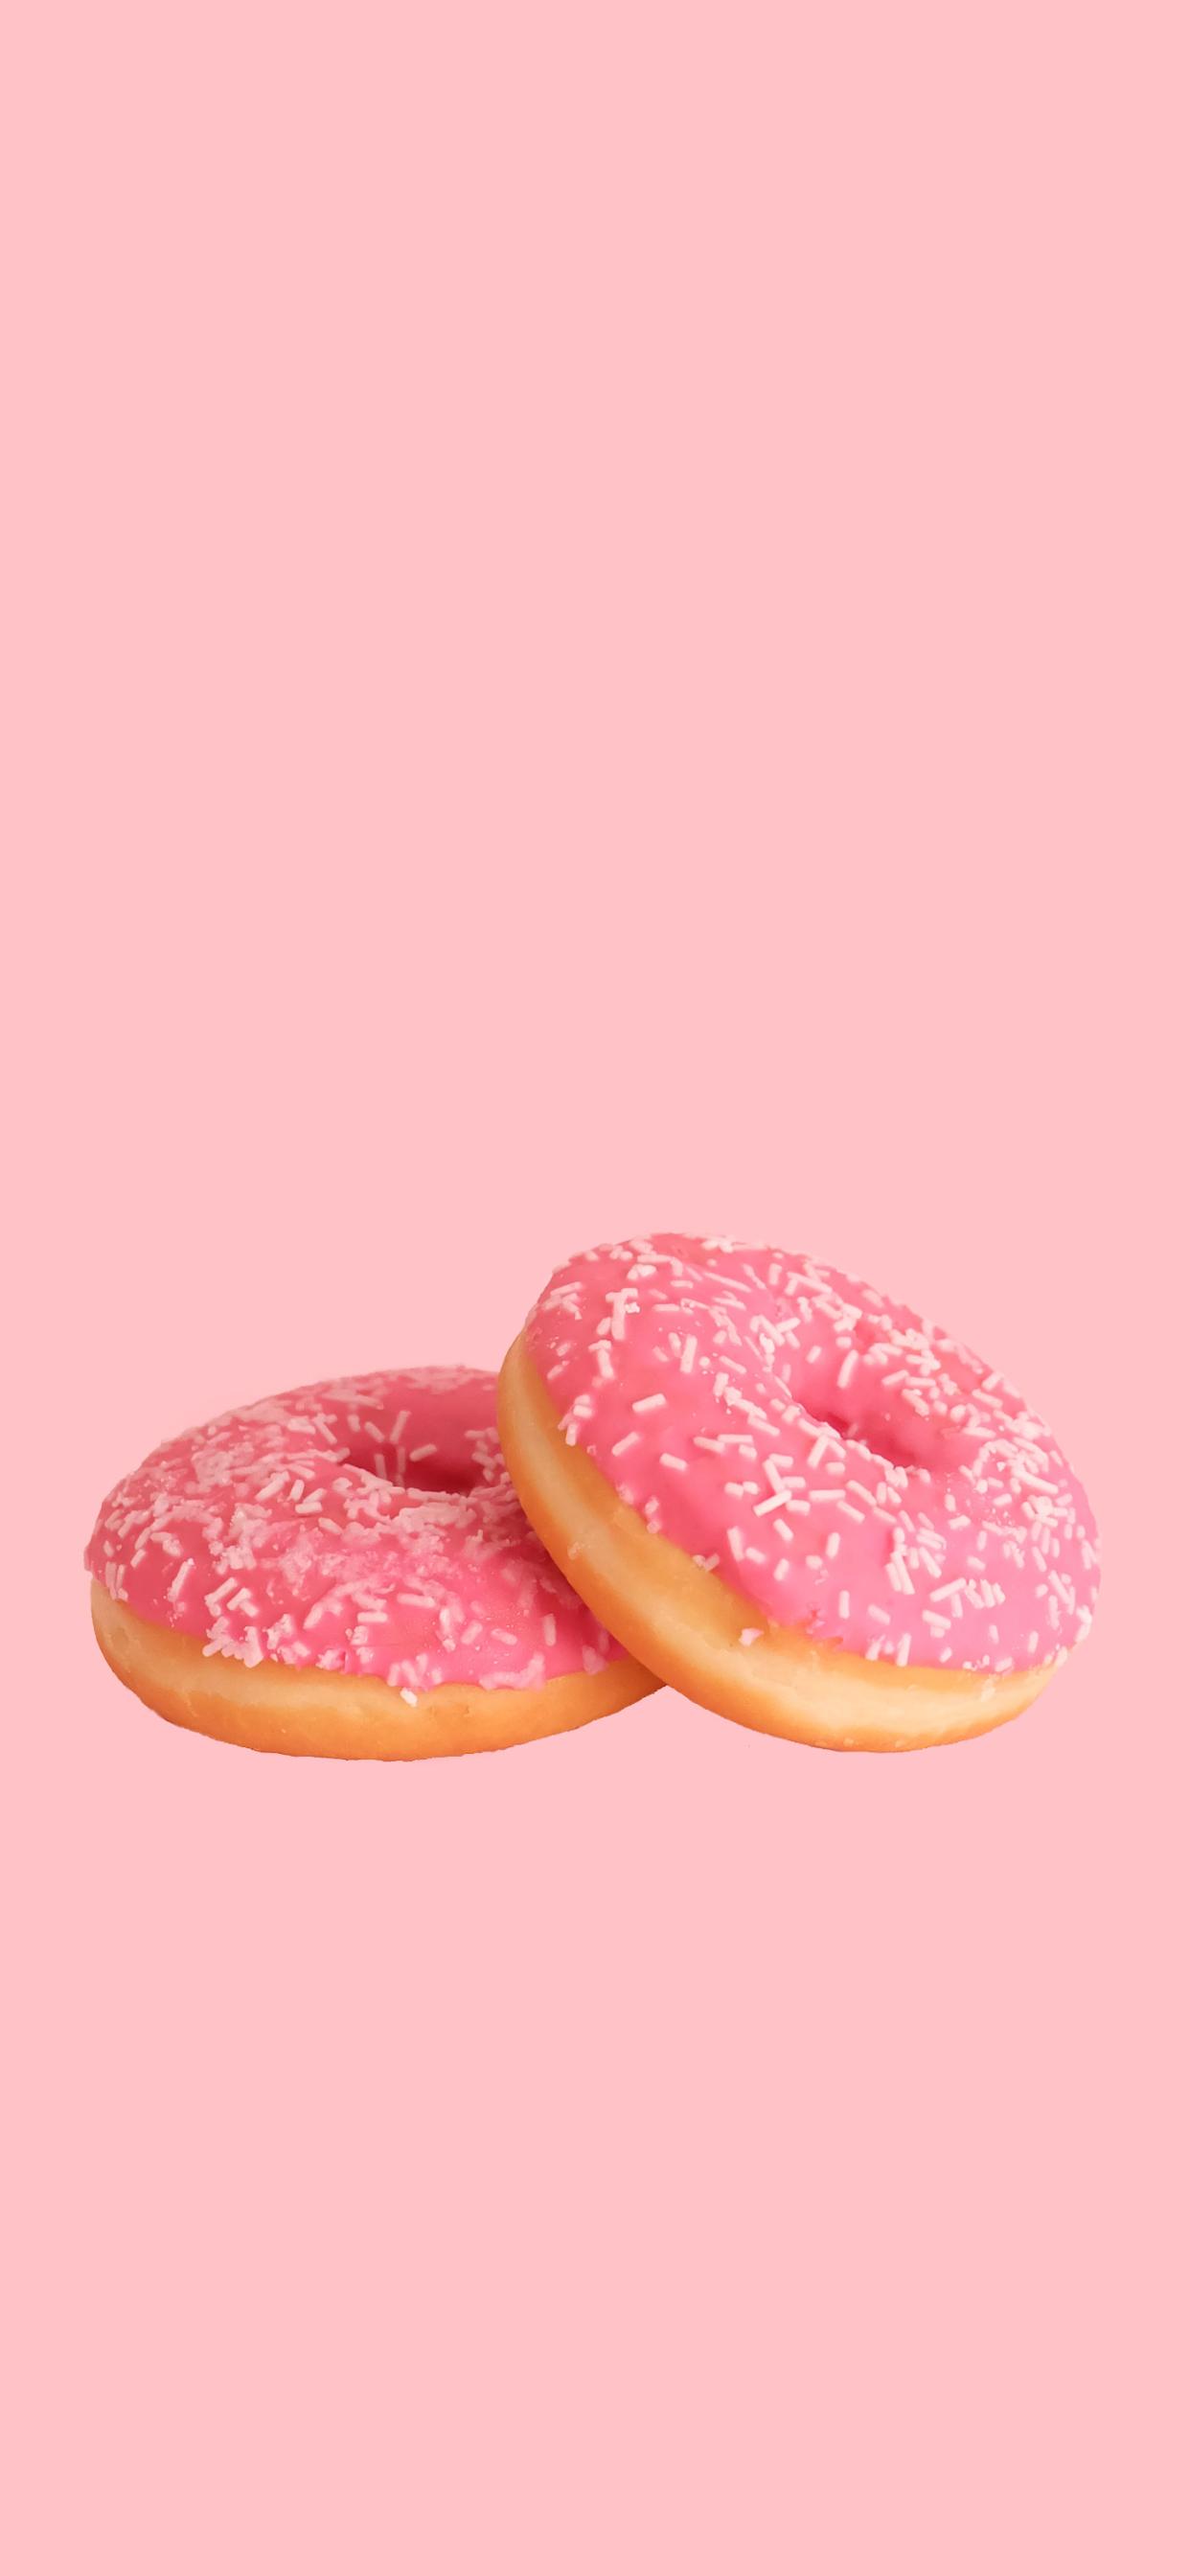 iPhone wallpapers colors pink donuts Fonds d'écran iPhone du 17/09/2019